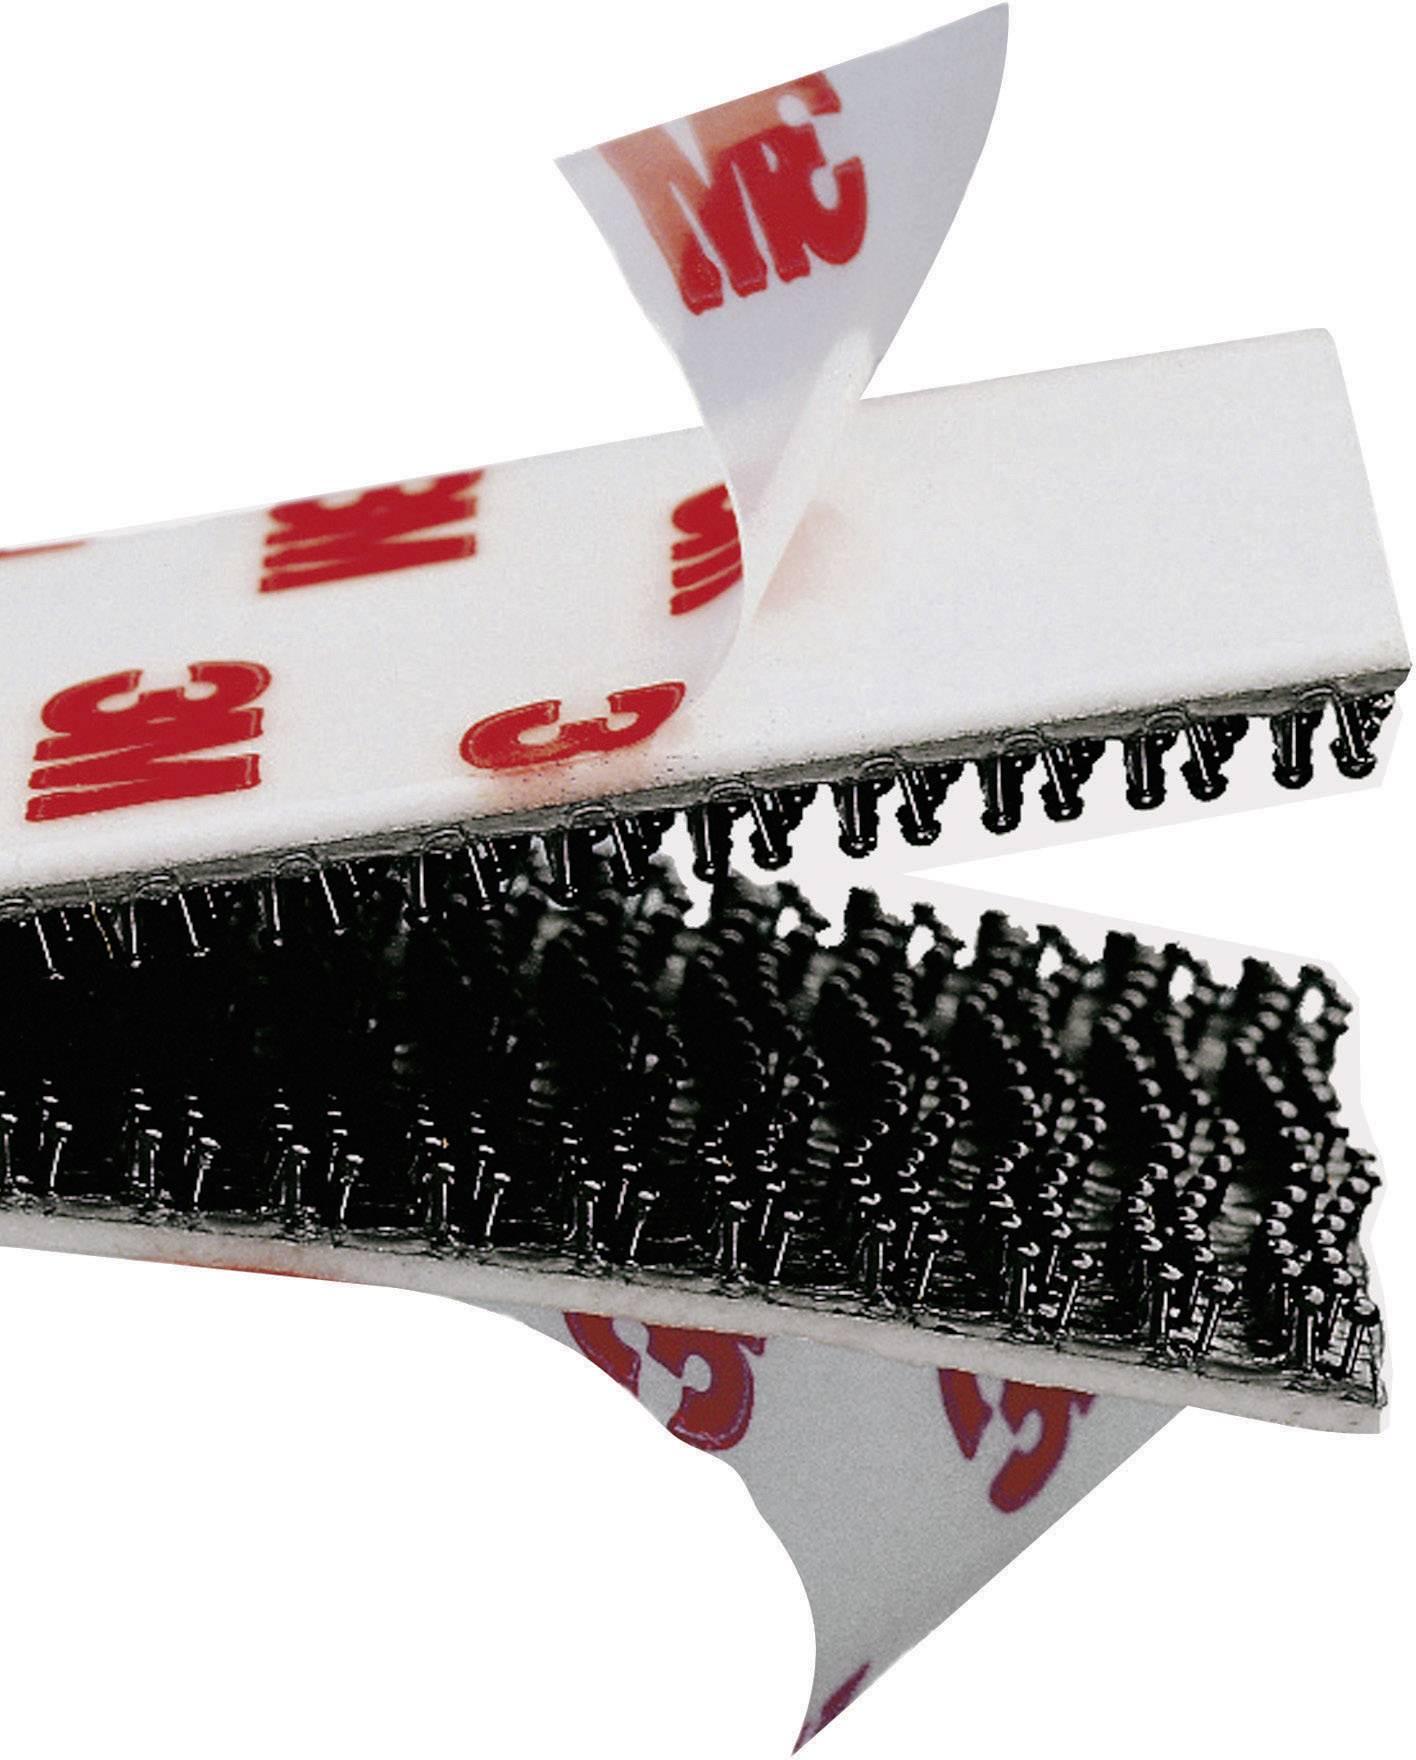 Lepiaci pásik so suchým zipsom 3M SJ 3551, (d x š) 1000 mm x 19 mm, čierna, metrový tovar